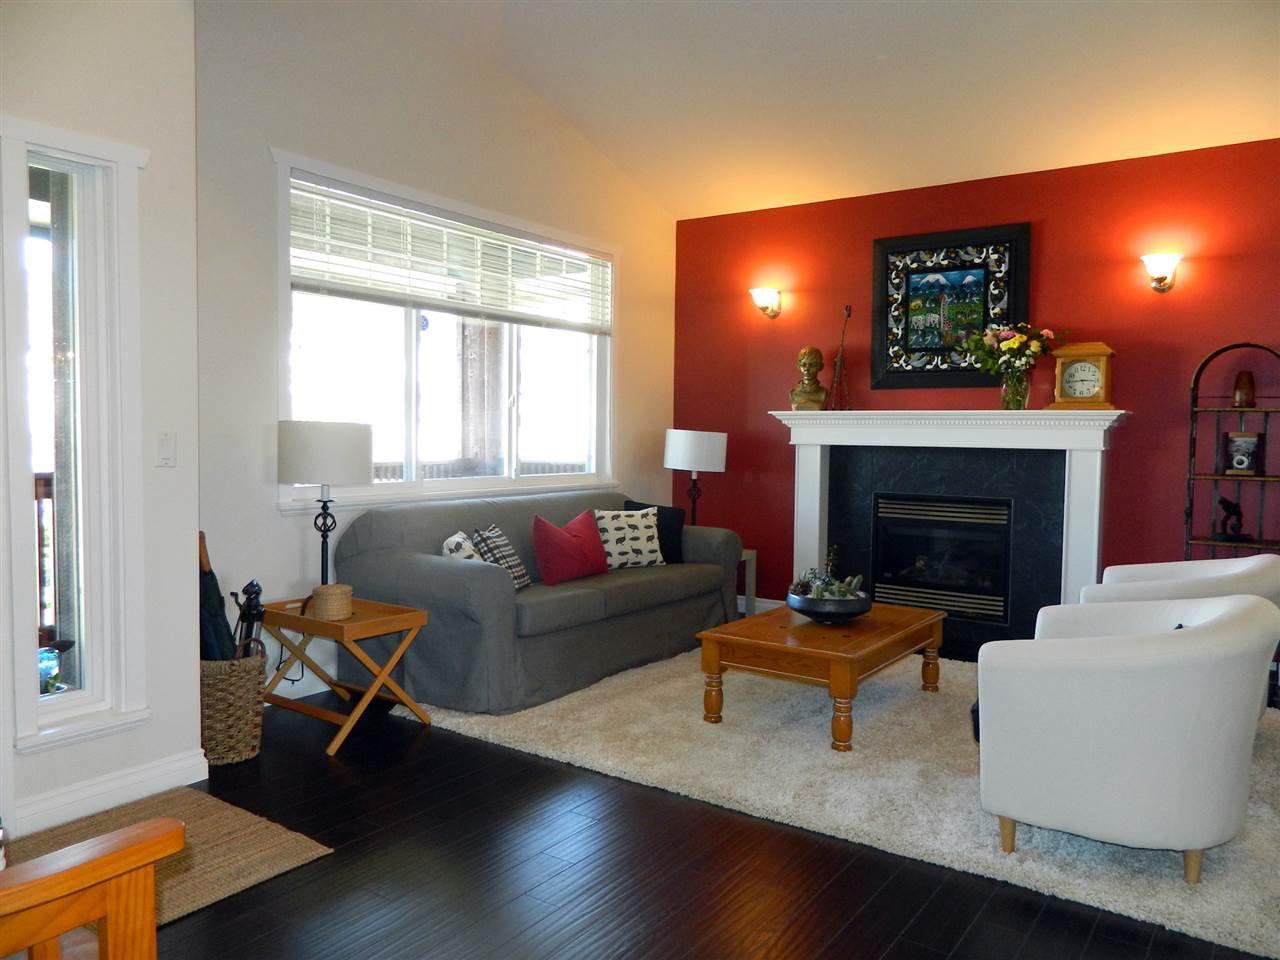 Photo 4: Photos: 24332 104 AVENUE in Maple Ridge: Albion House for sale : MLS®# R2051414